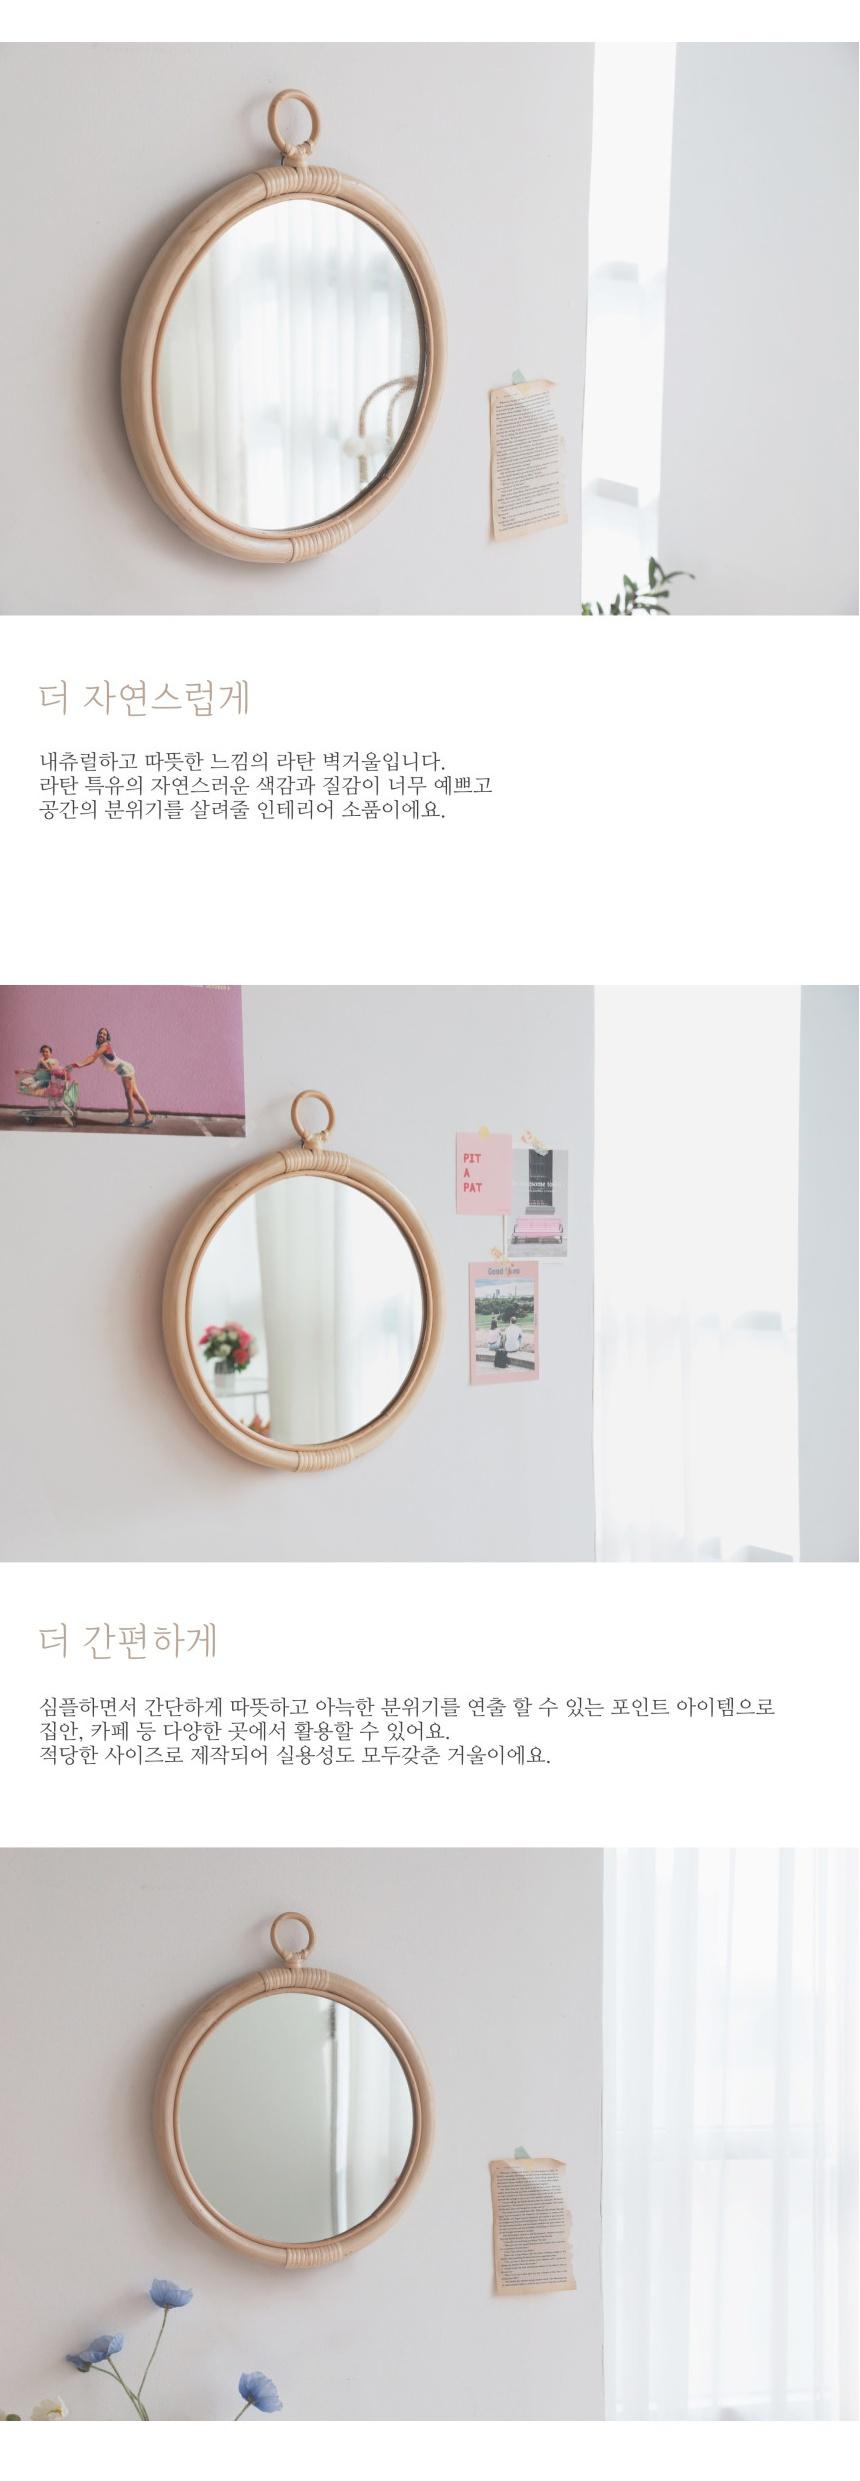 lattan_frame_mirror_02.jpg